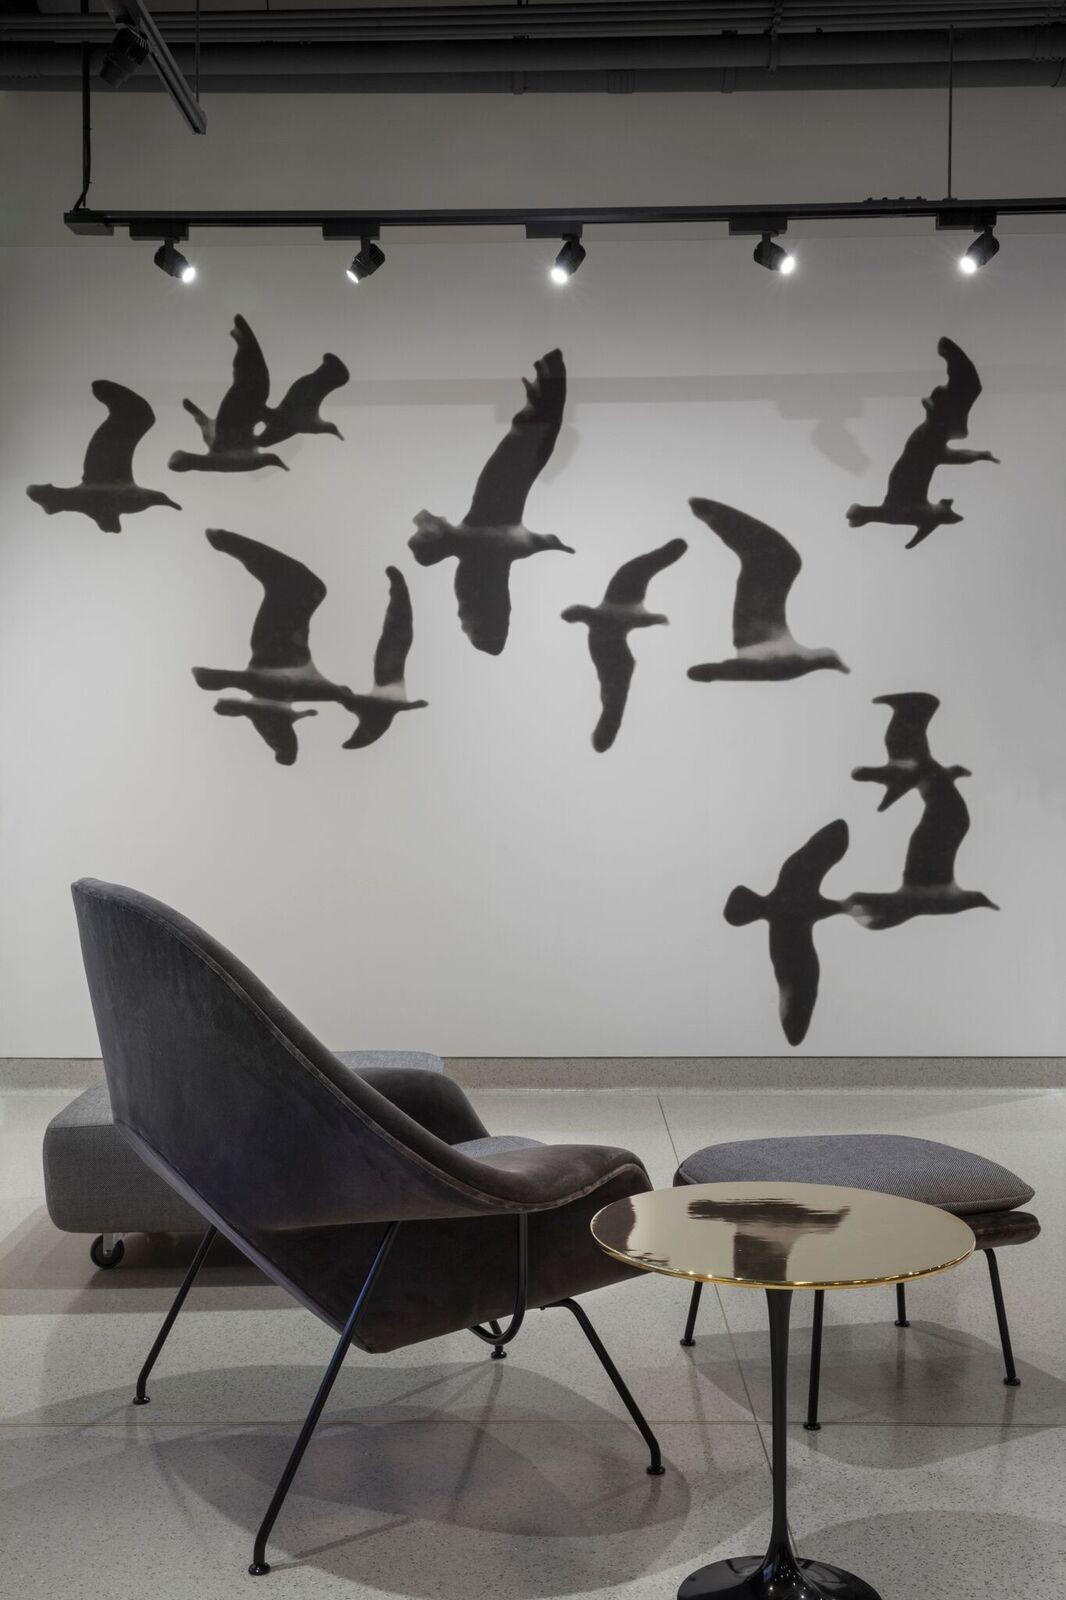 Knoll Showroom, Los Angeles, by ARO